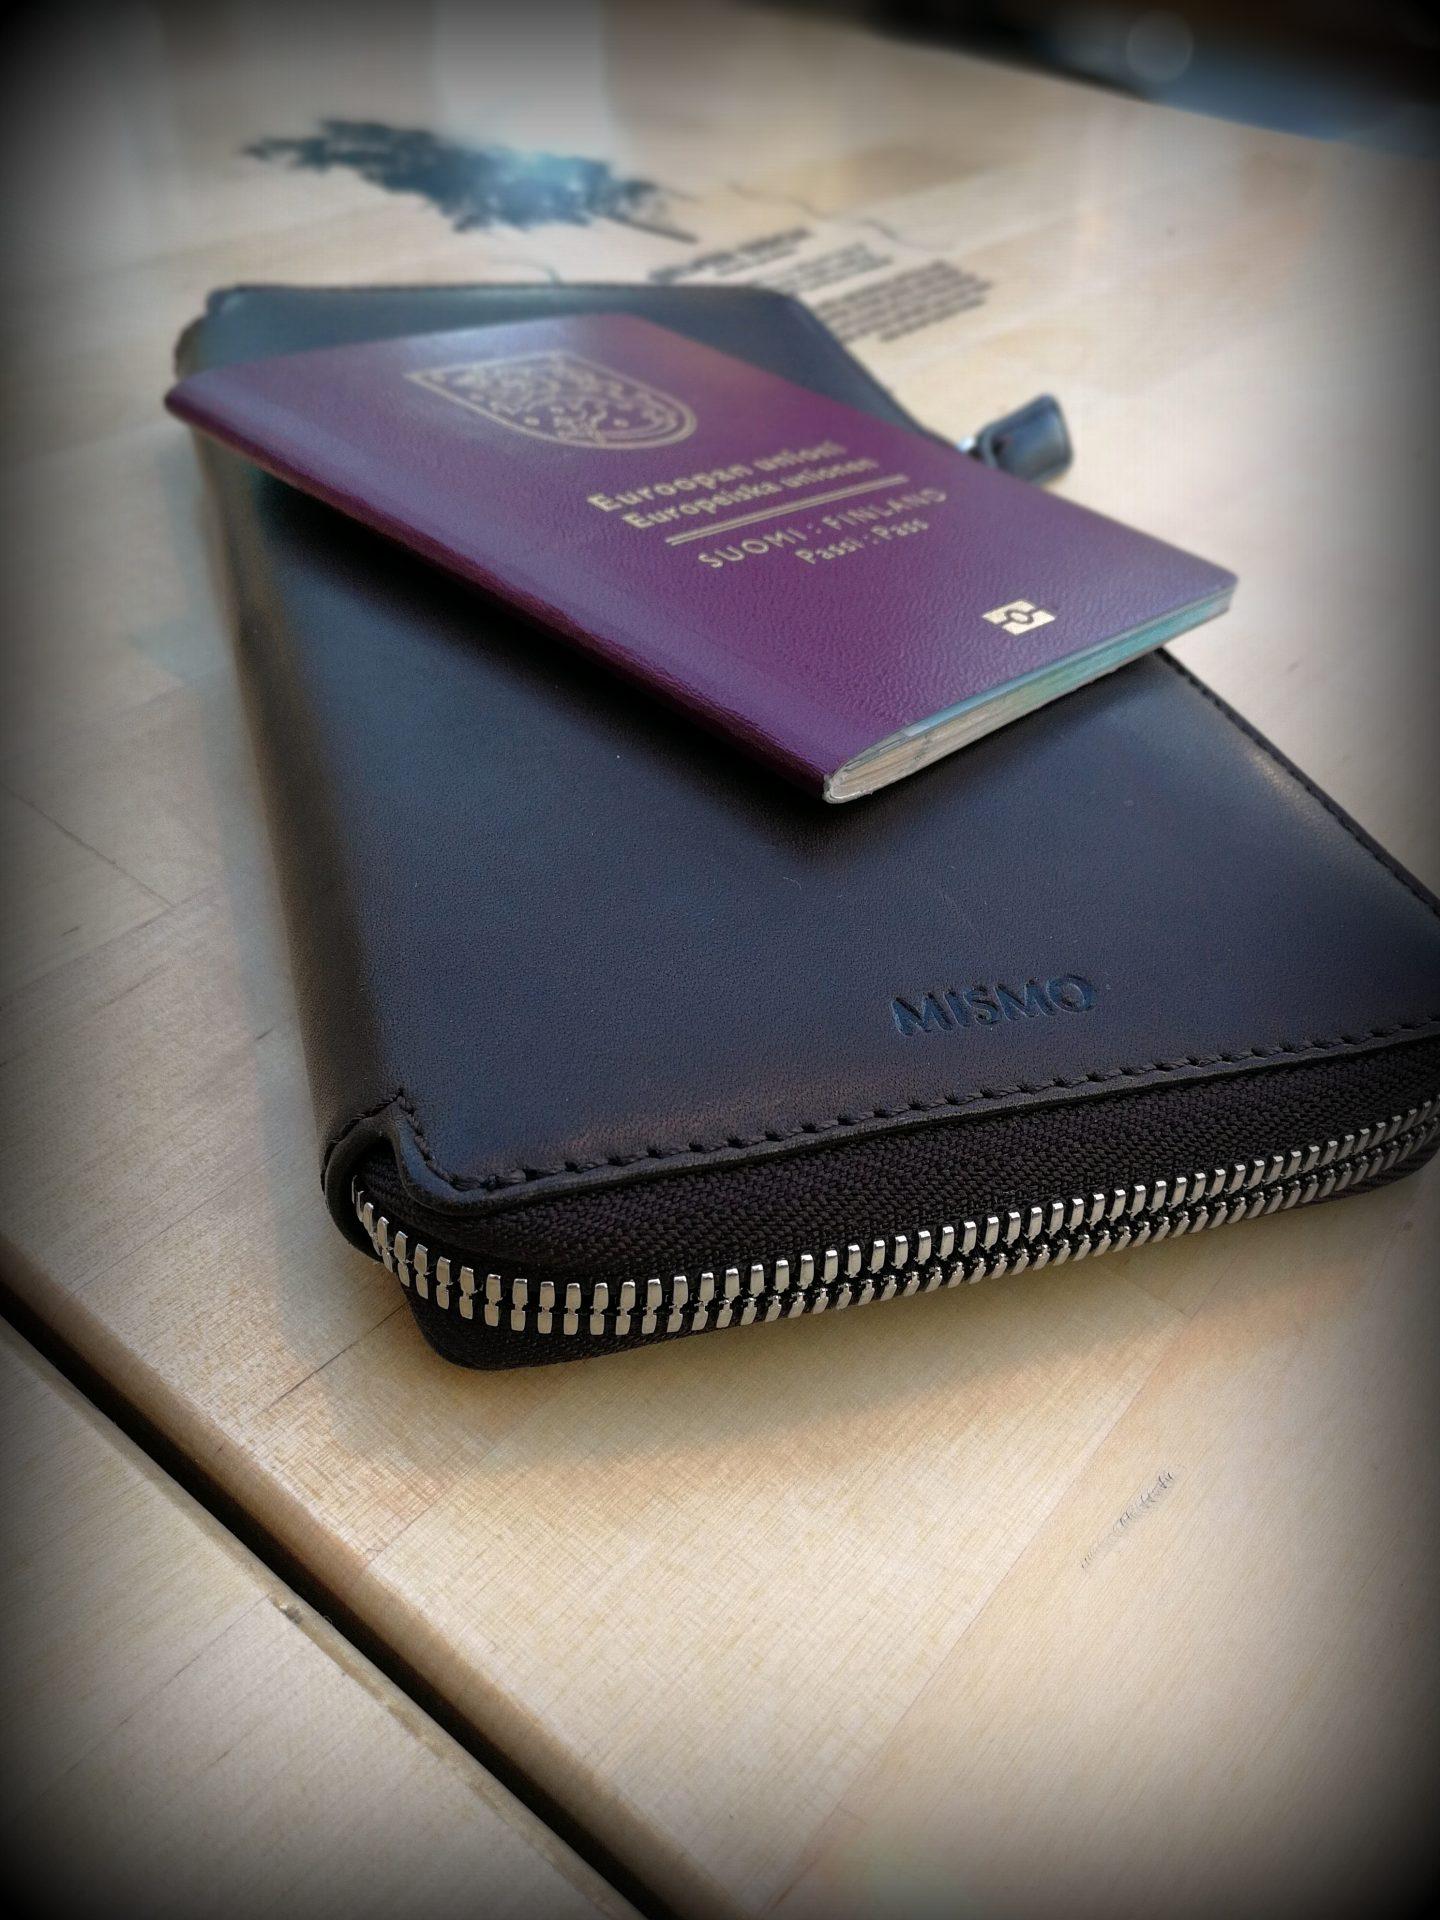 Viikonloppu-Kööpenhaminassa-Huawei-P10-mismo-passport-cover.